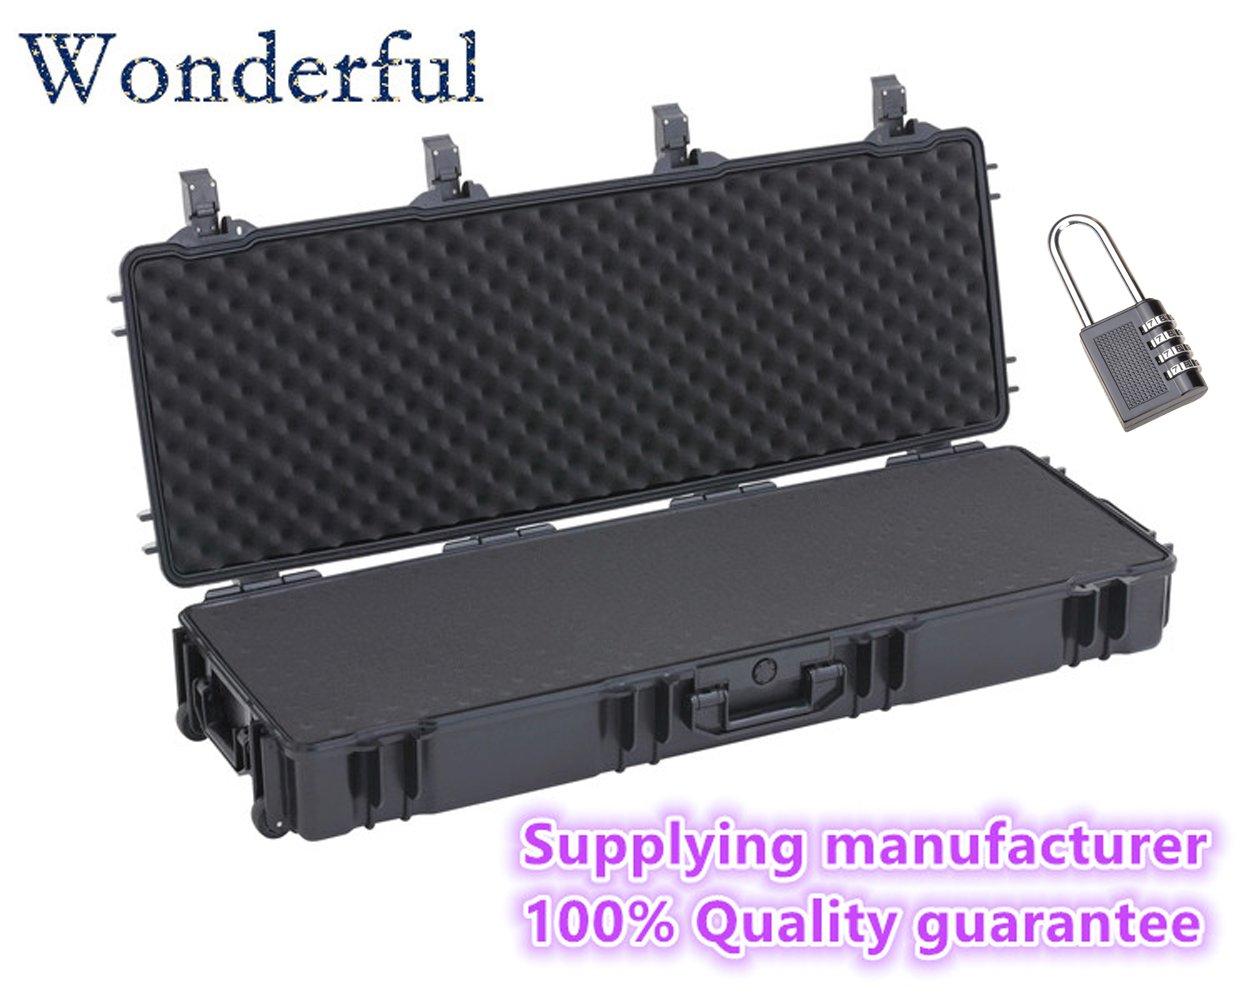 Wonderful pc-12016 WatertightケースABS素材、密封防水、防塵to keep your製品Dry and、カスタマイズ可能、取り外し可能Pick N Pluck Foam (ブラック)   B01ELKZ4XC